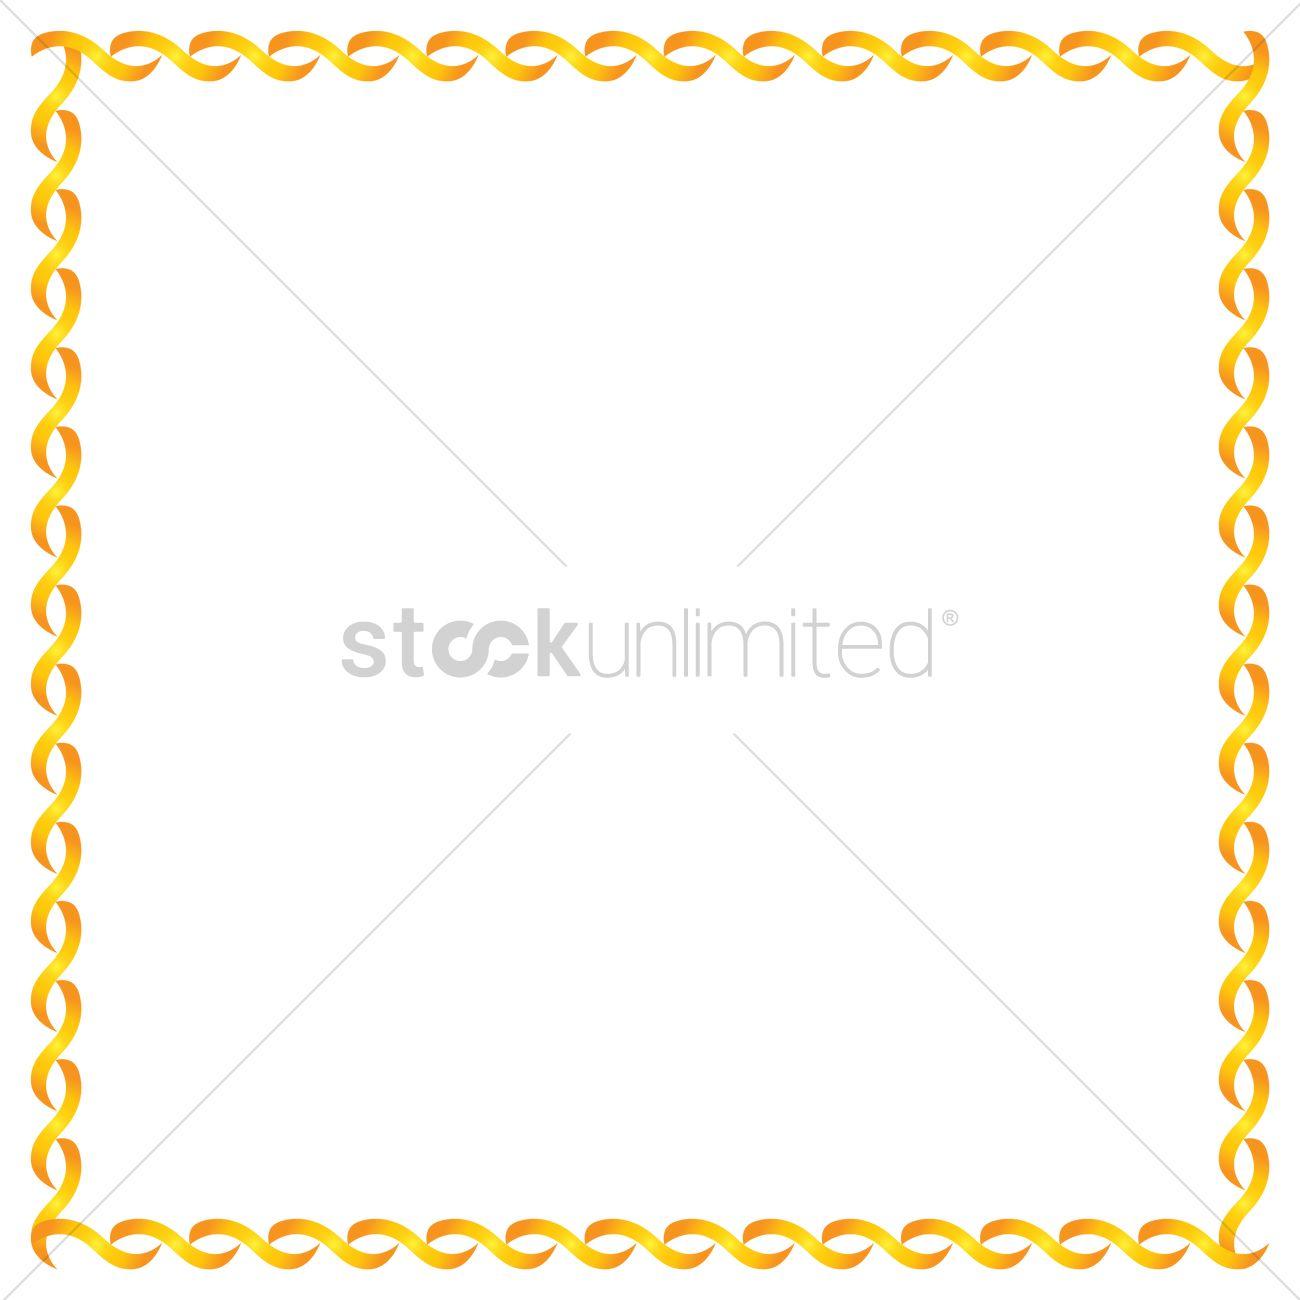 simple pattern frame border vector image 1343205